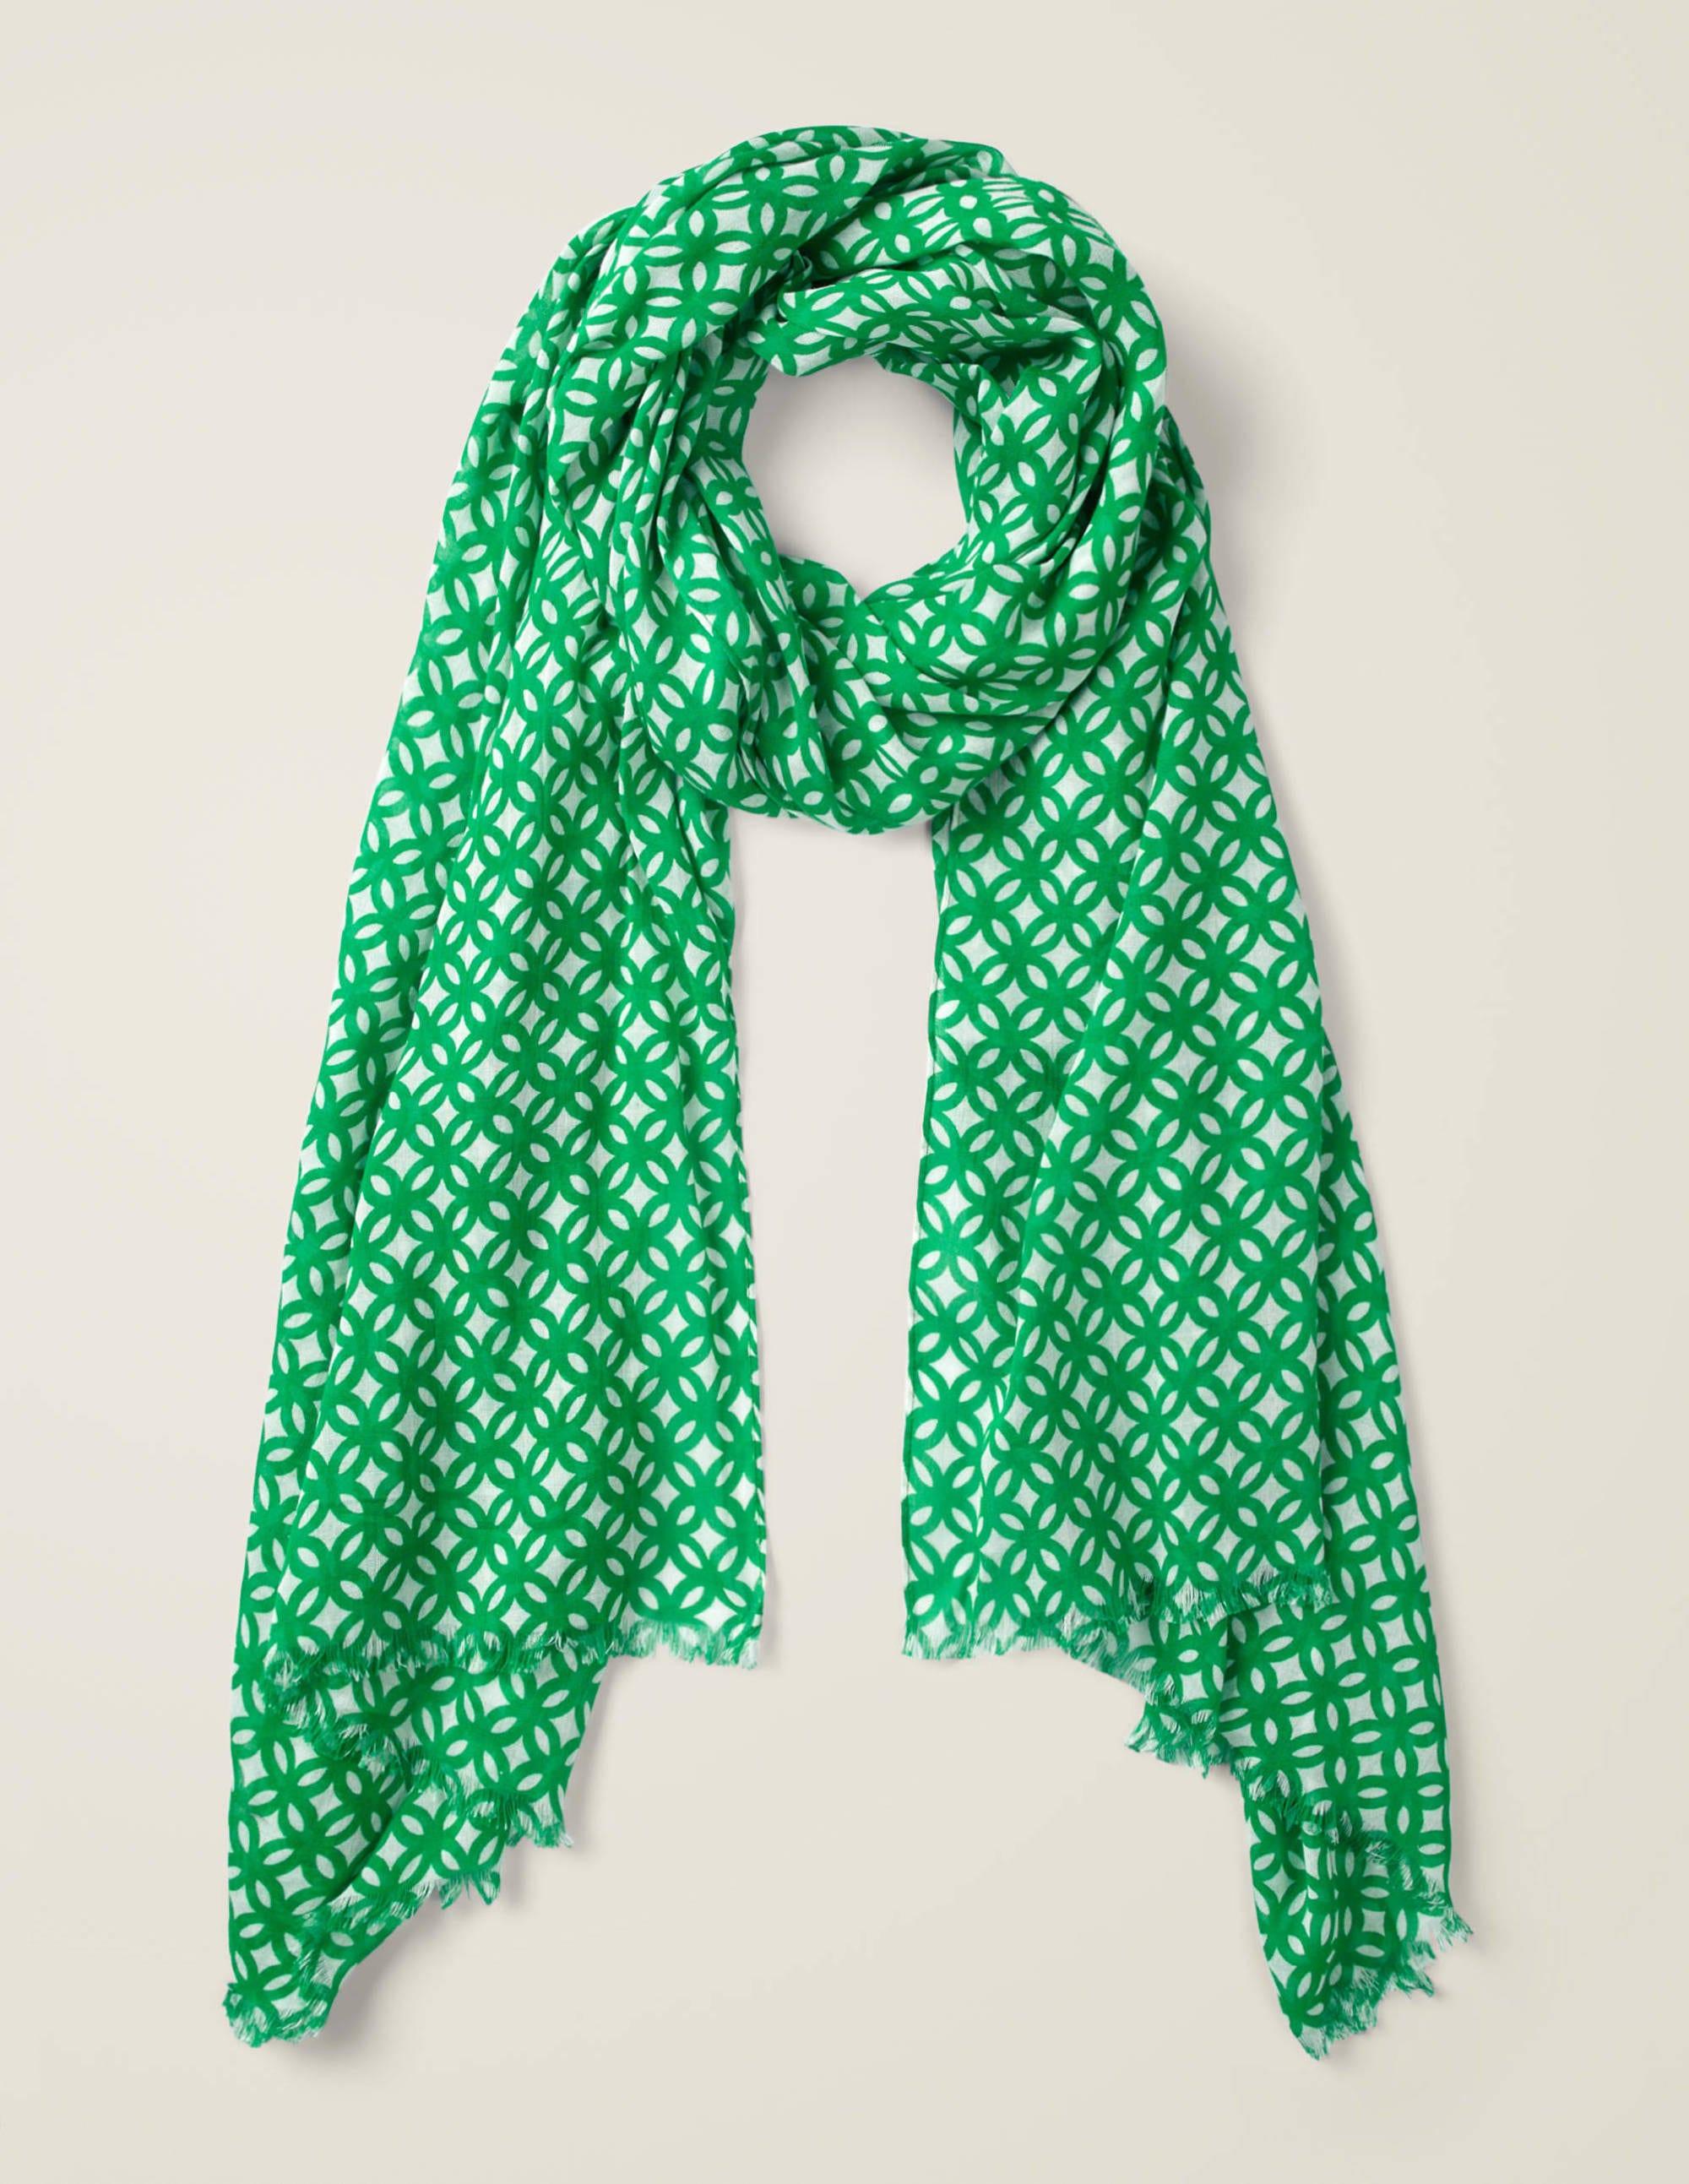 Foulard imprimé BGR Femme Boden, Green